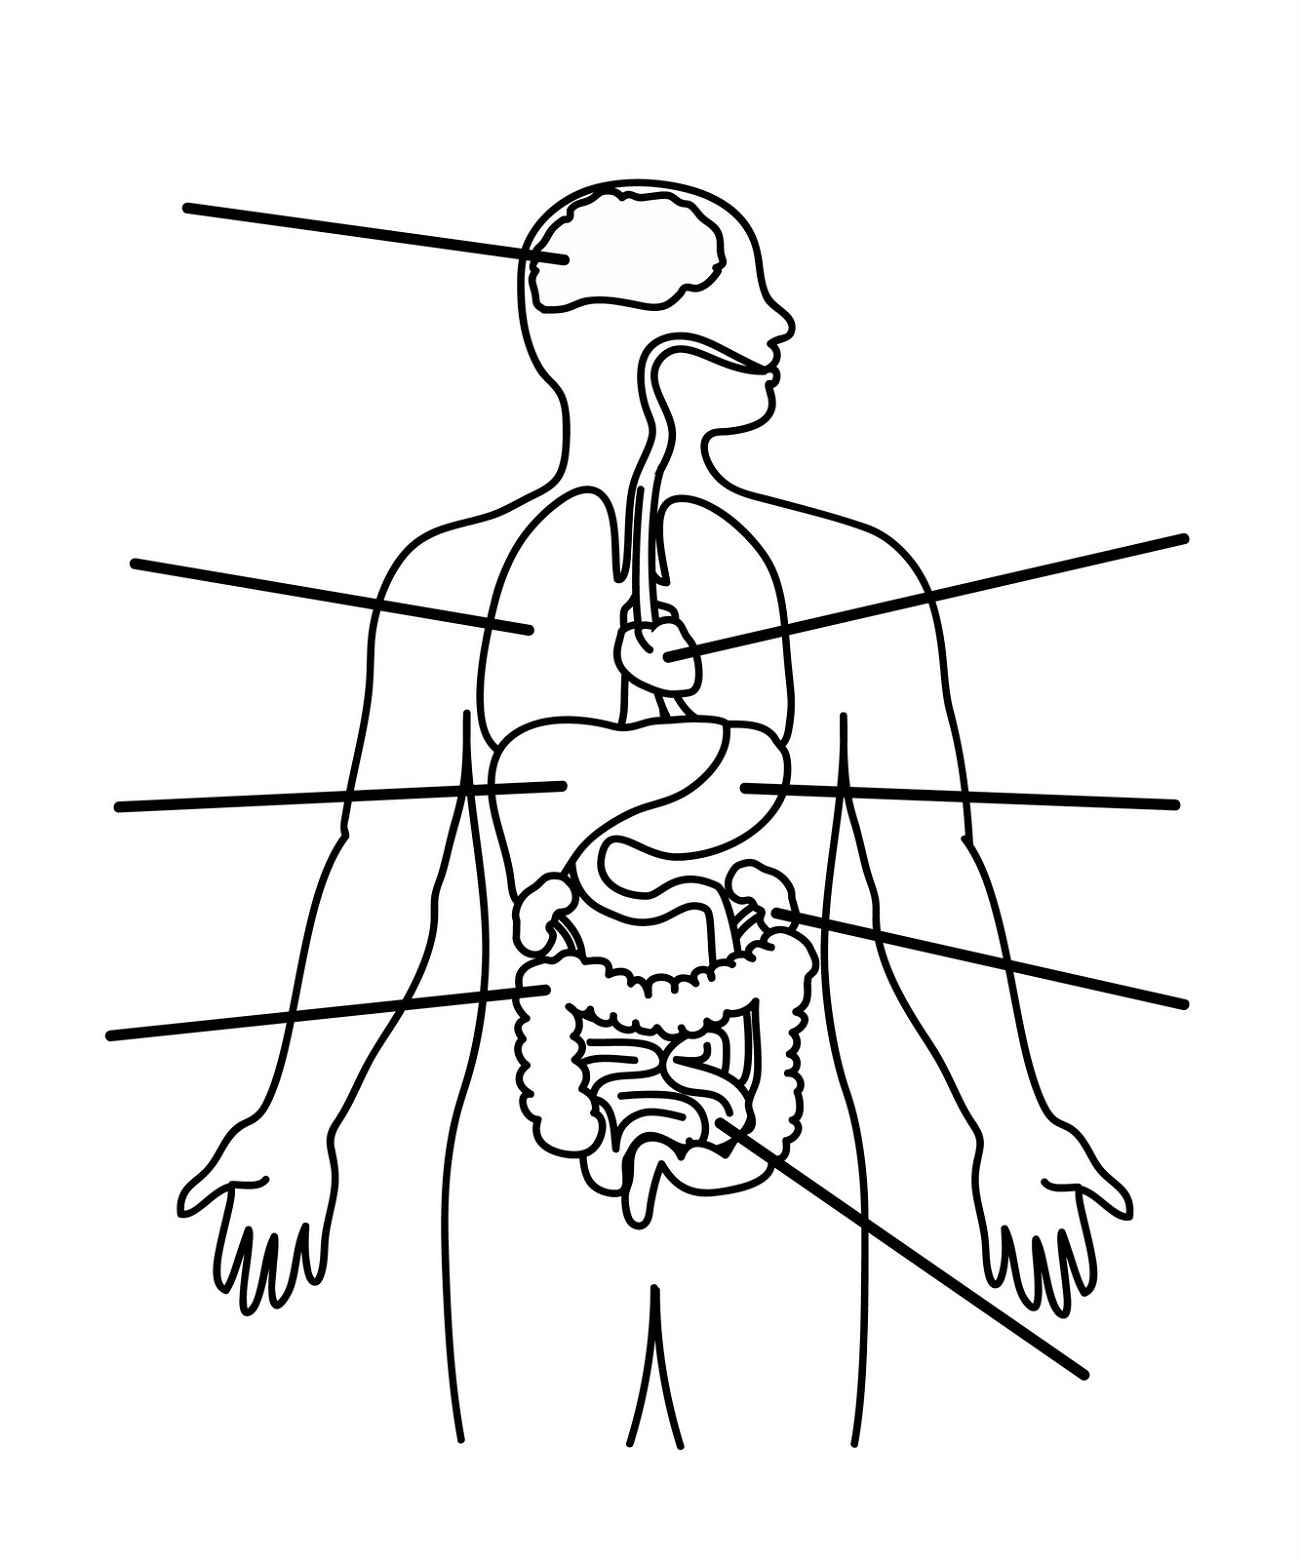 Blank Human Diagram